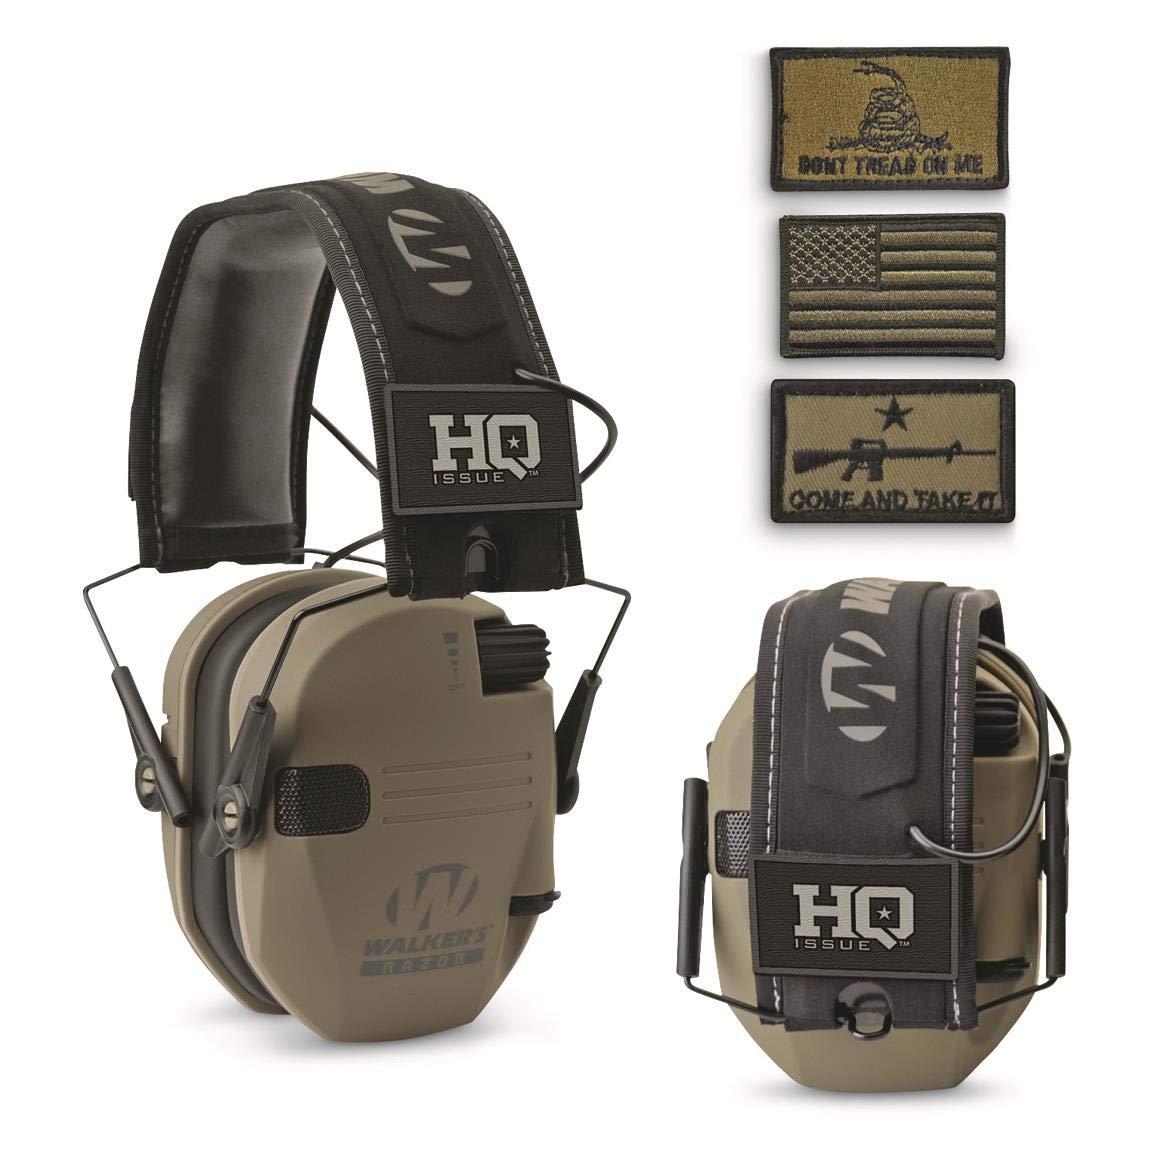 HQ Issue Walker's Patriot Series Electronic Ear Muffs, Flat Dark Earth